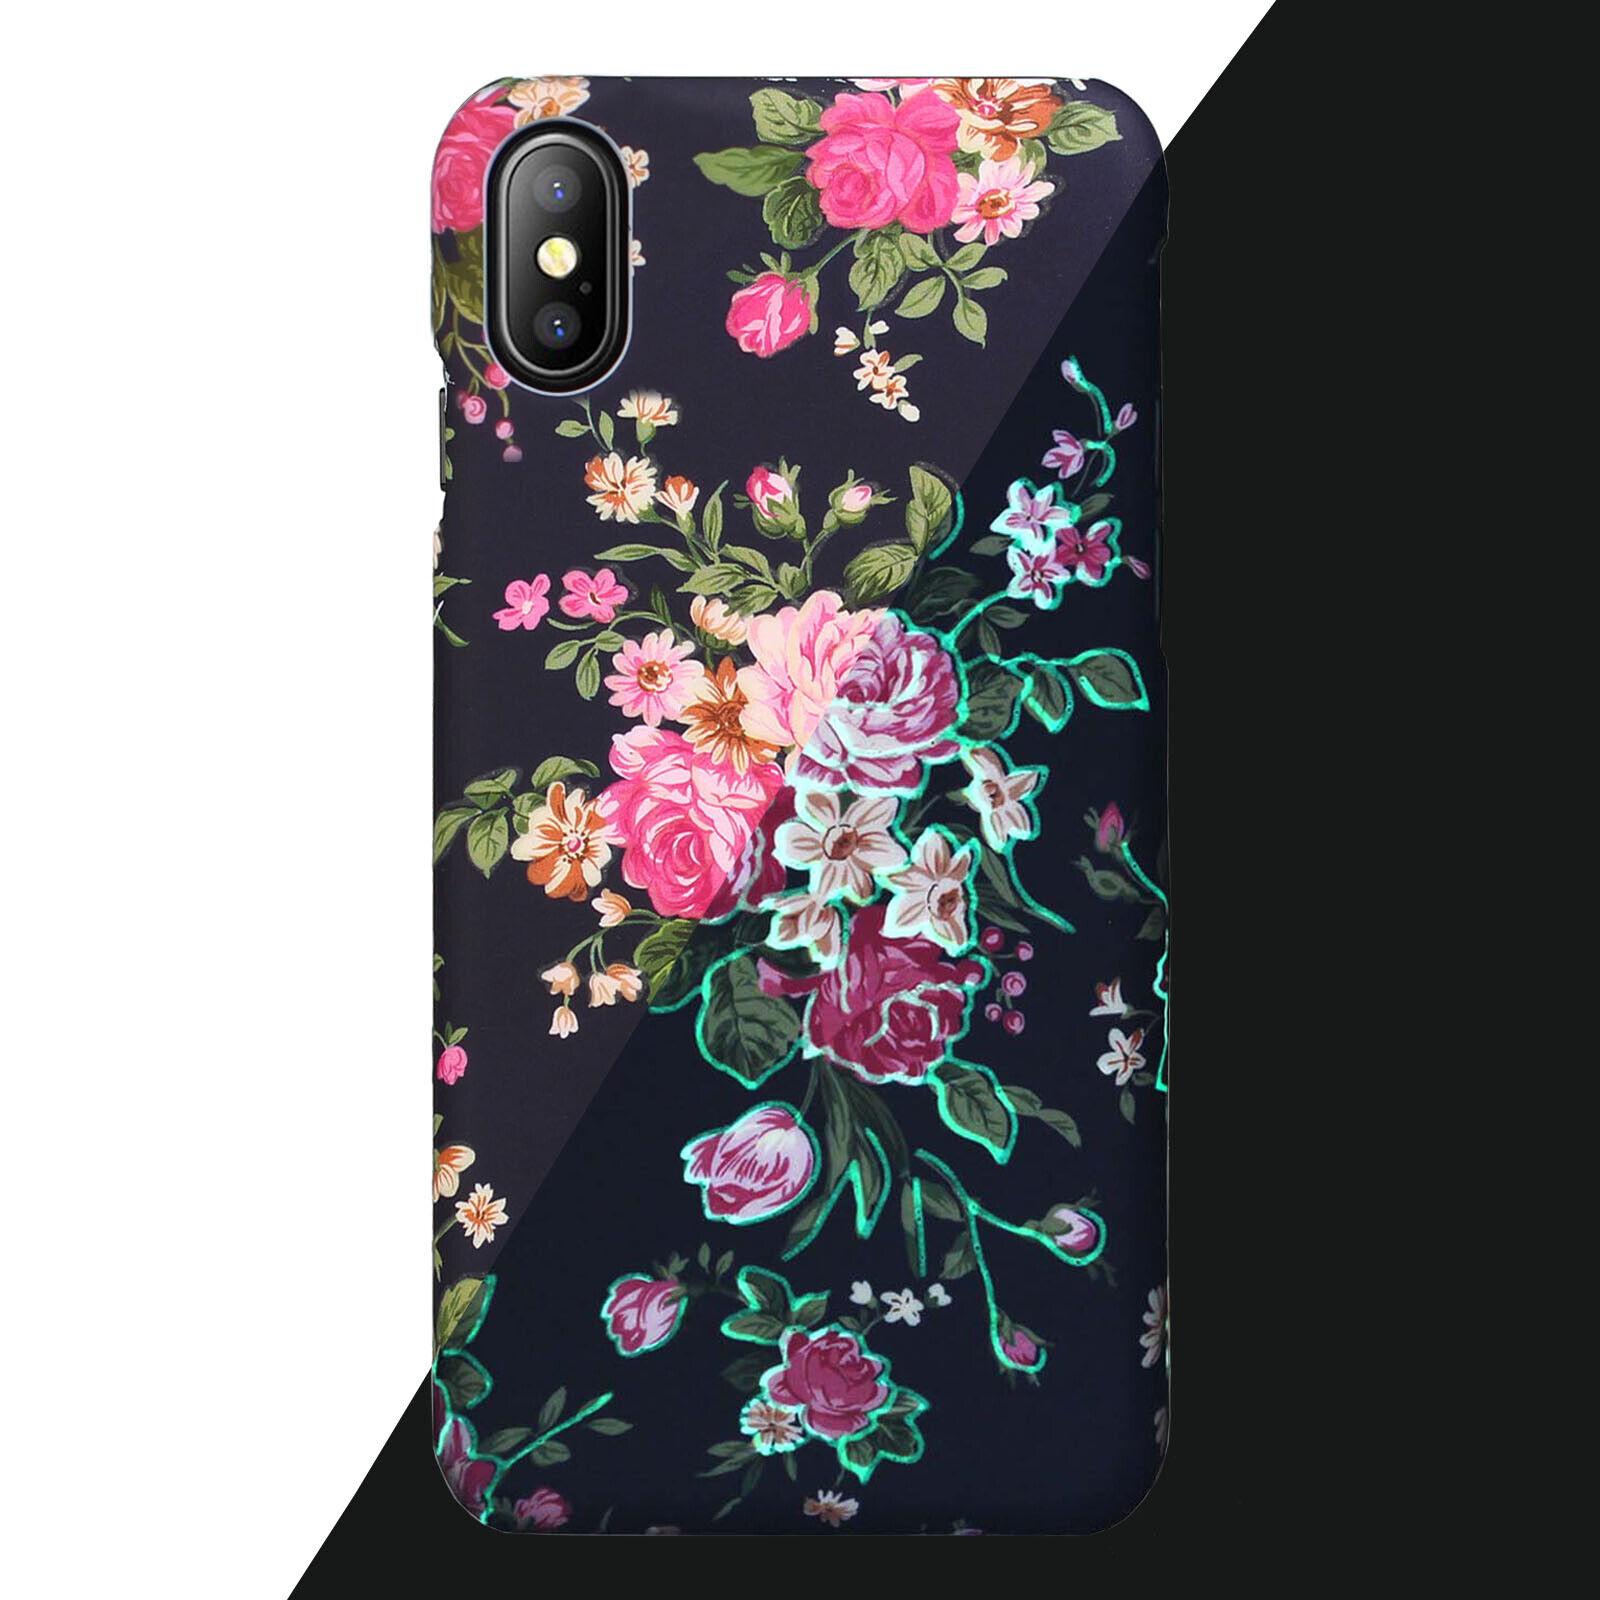 Yellow-Price Premium Retro Floral Series Rubber Case+Glass,i